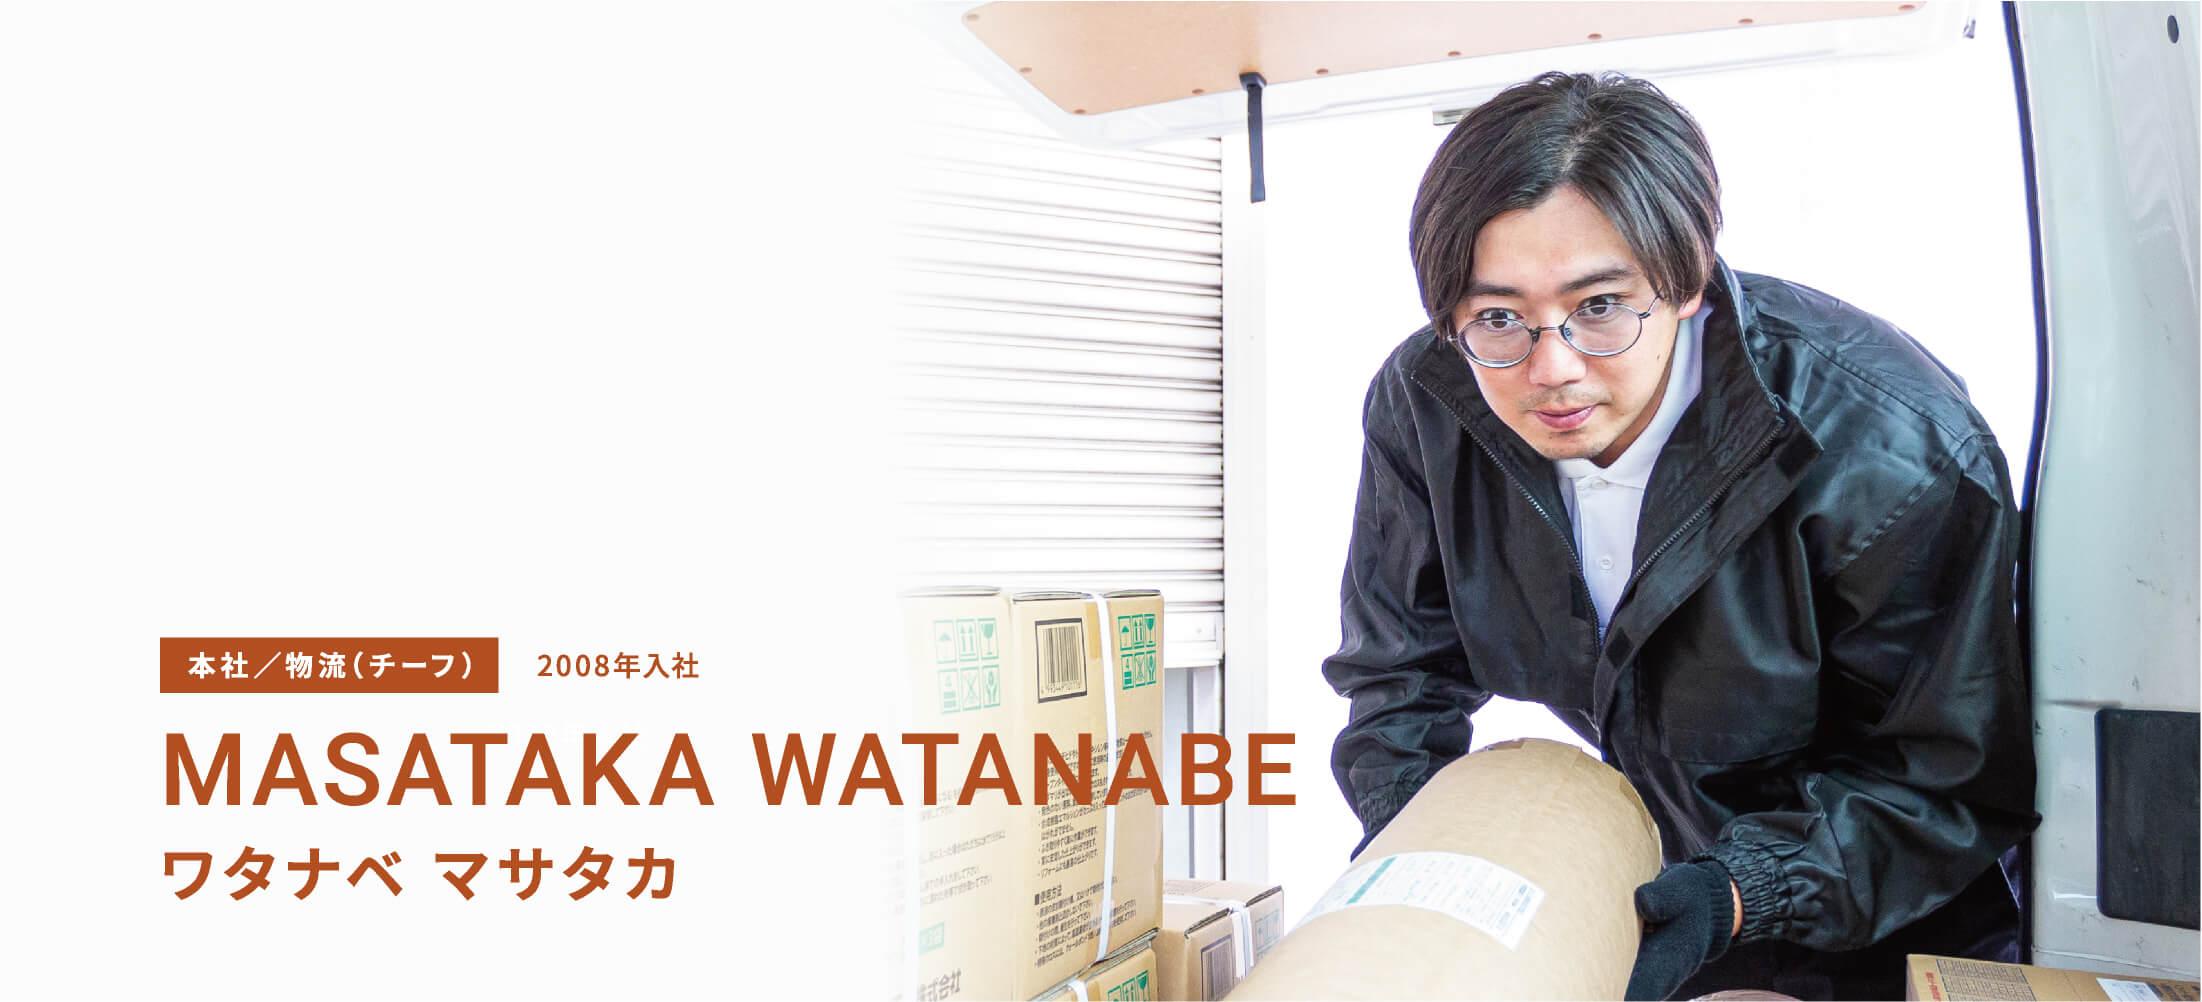 MASATAKA WATANABE ワタナベ マサタカ